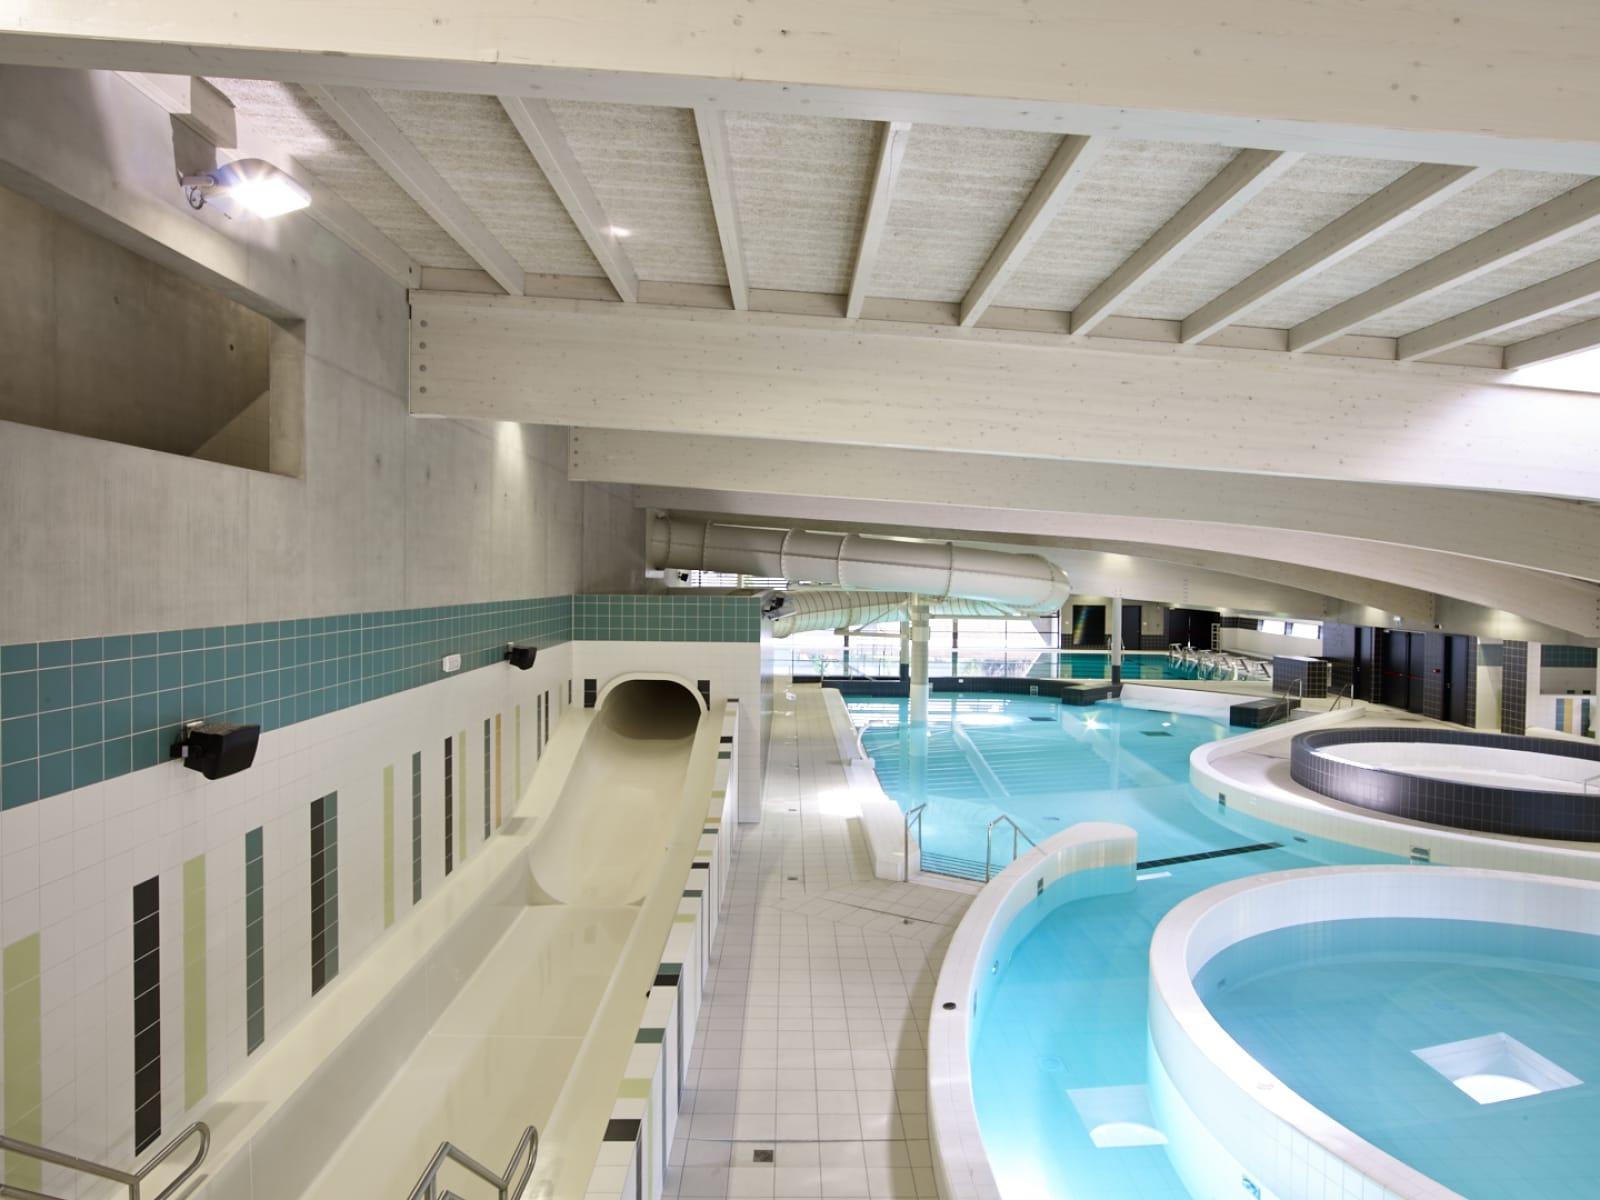 Zwembad poperinge realisatie bouwbedrijf furnibo nv